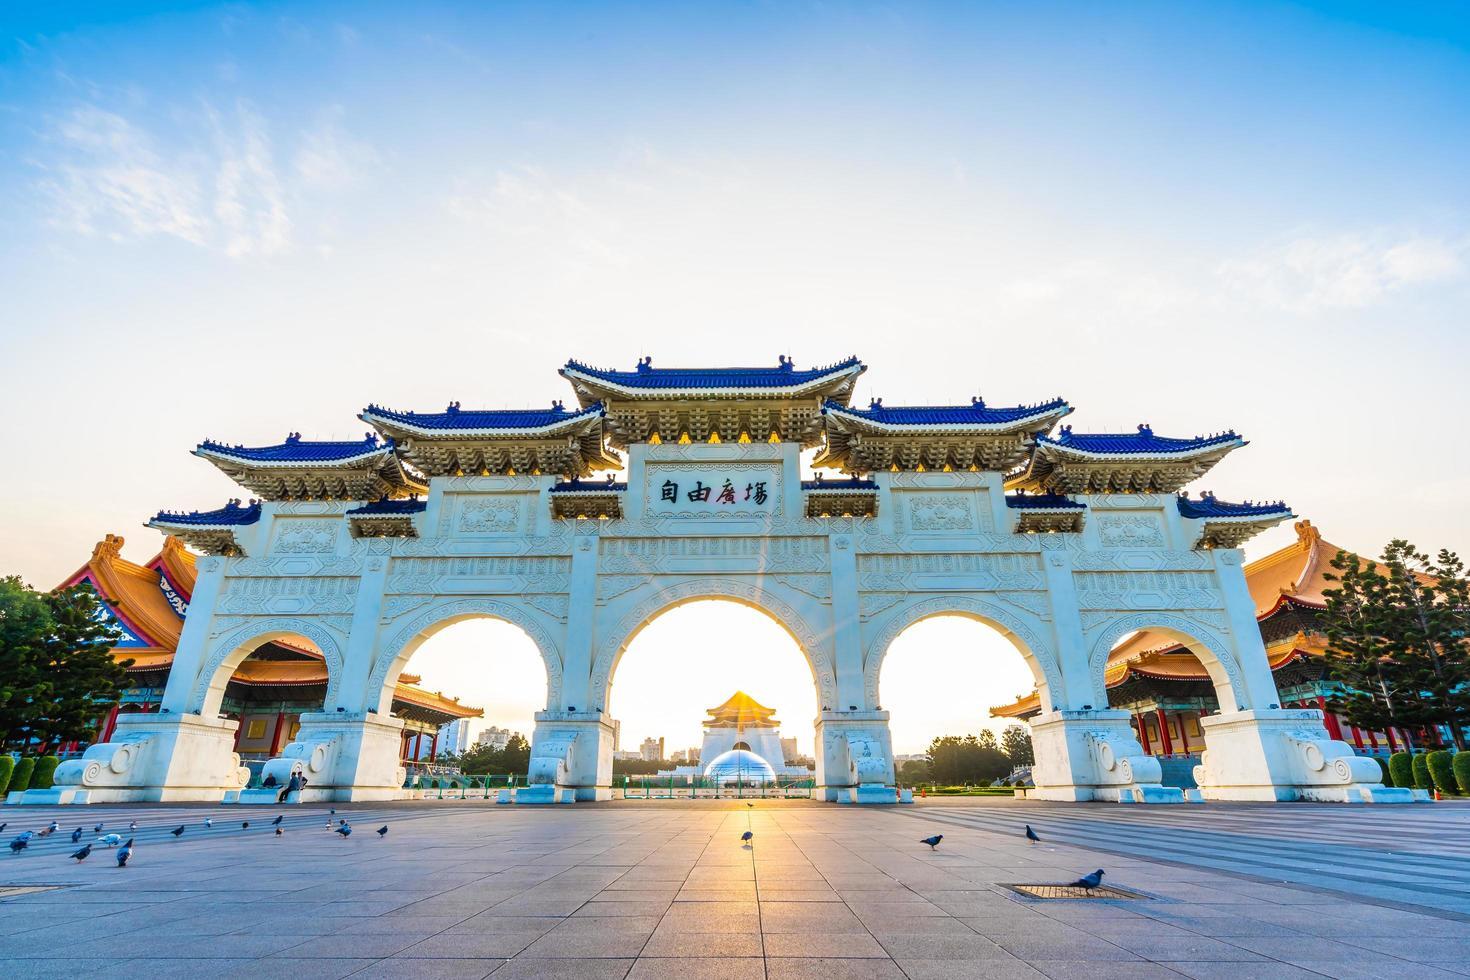 Salle commémorative de Chiang Kai-Shek dans la ville de Taipei, Taiwan photo